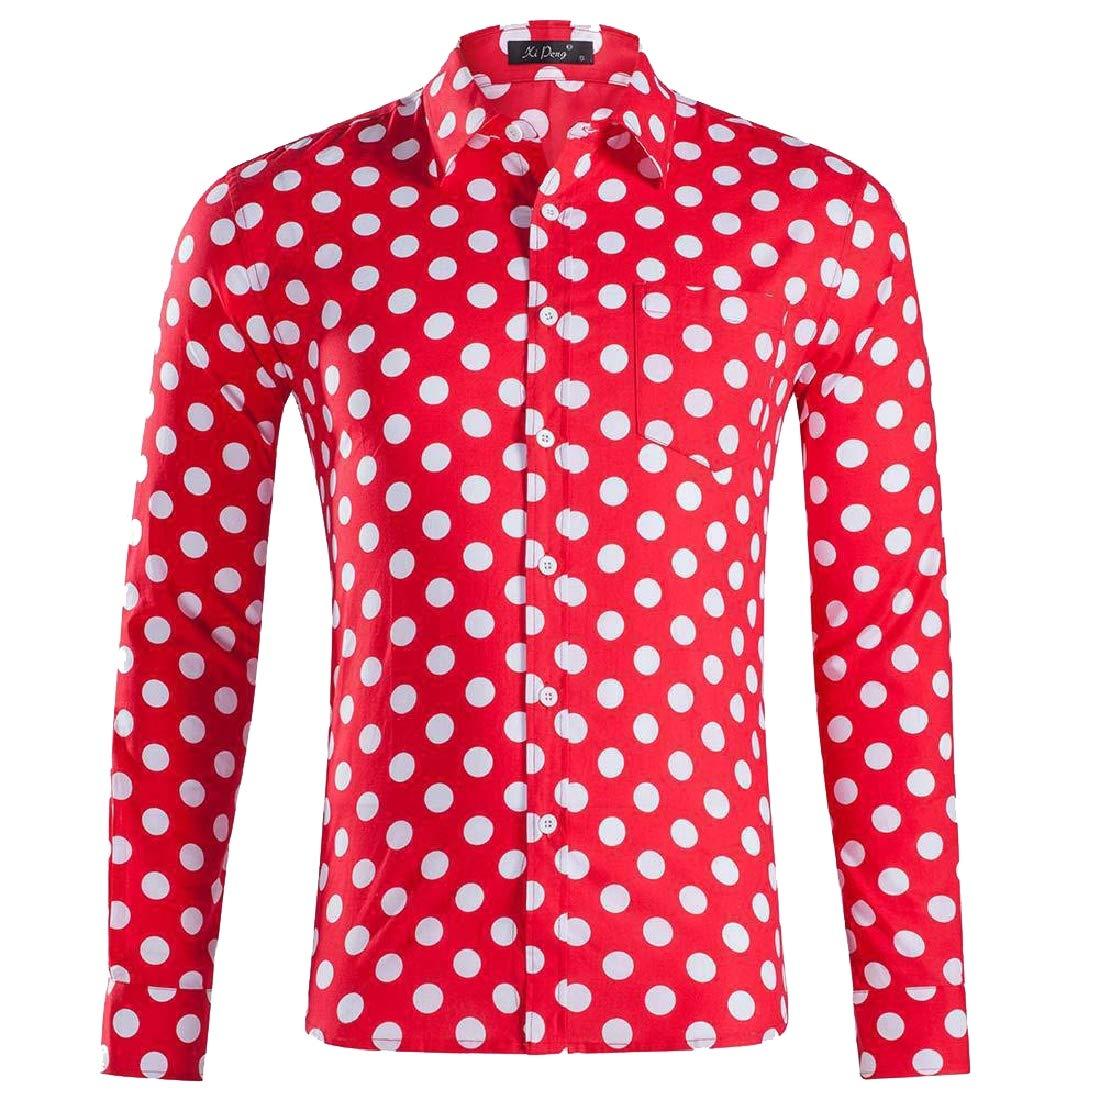 hower Men Casual Formal Polka Dot Long Sleeve Shirt Business Shirt Printed Blouse